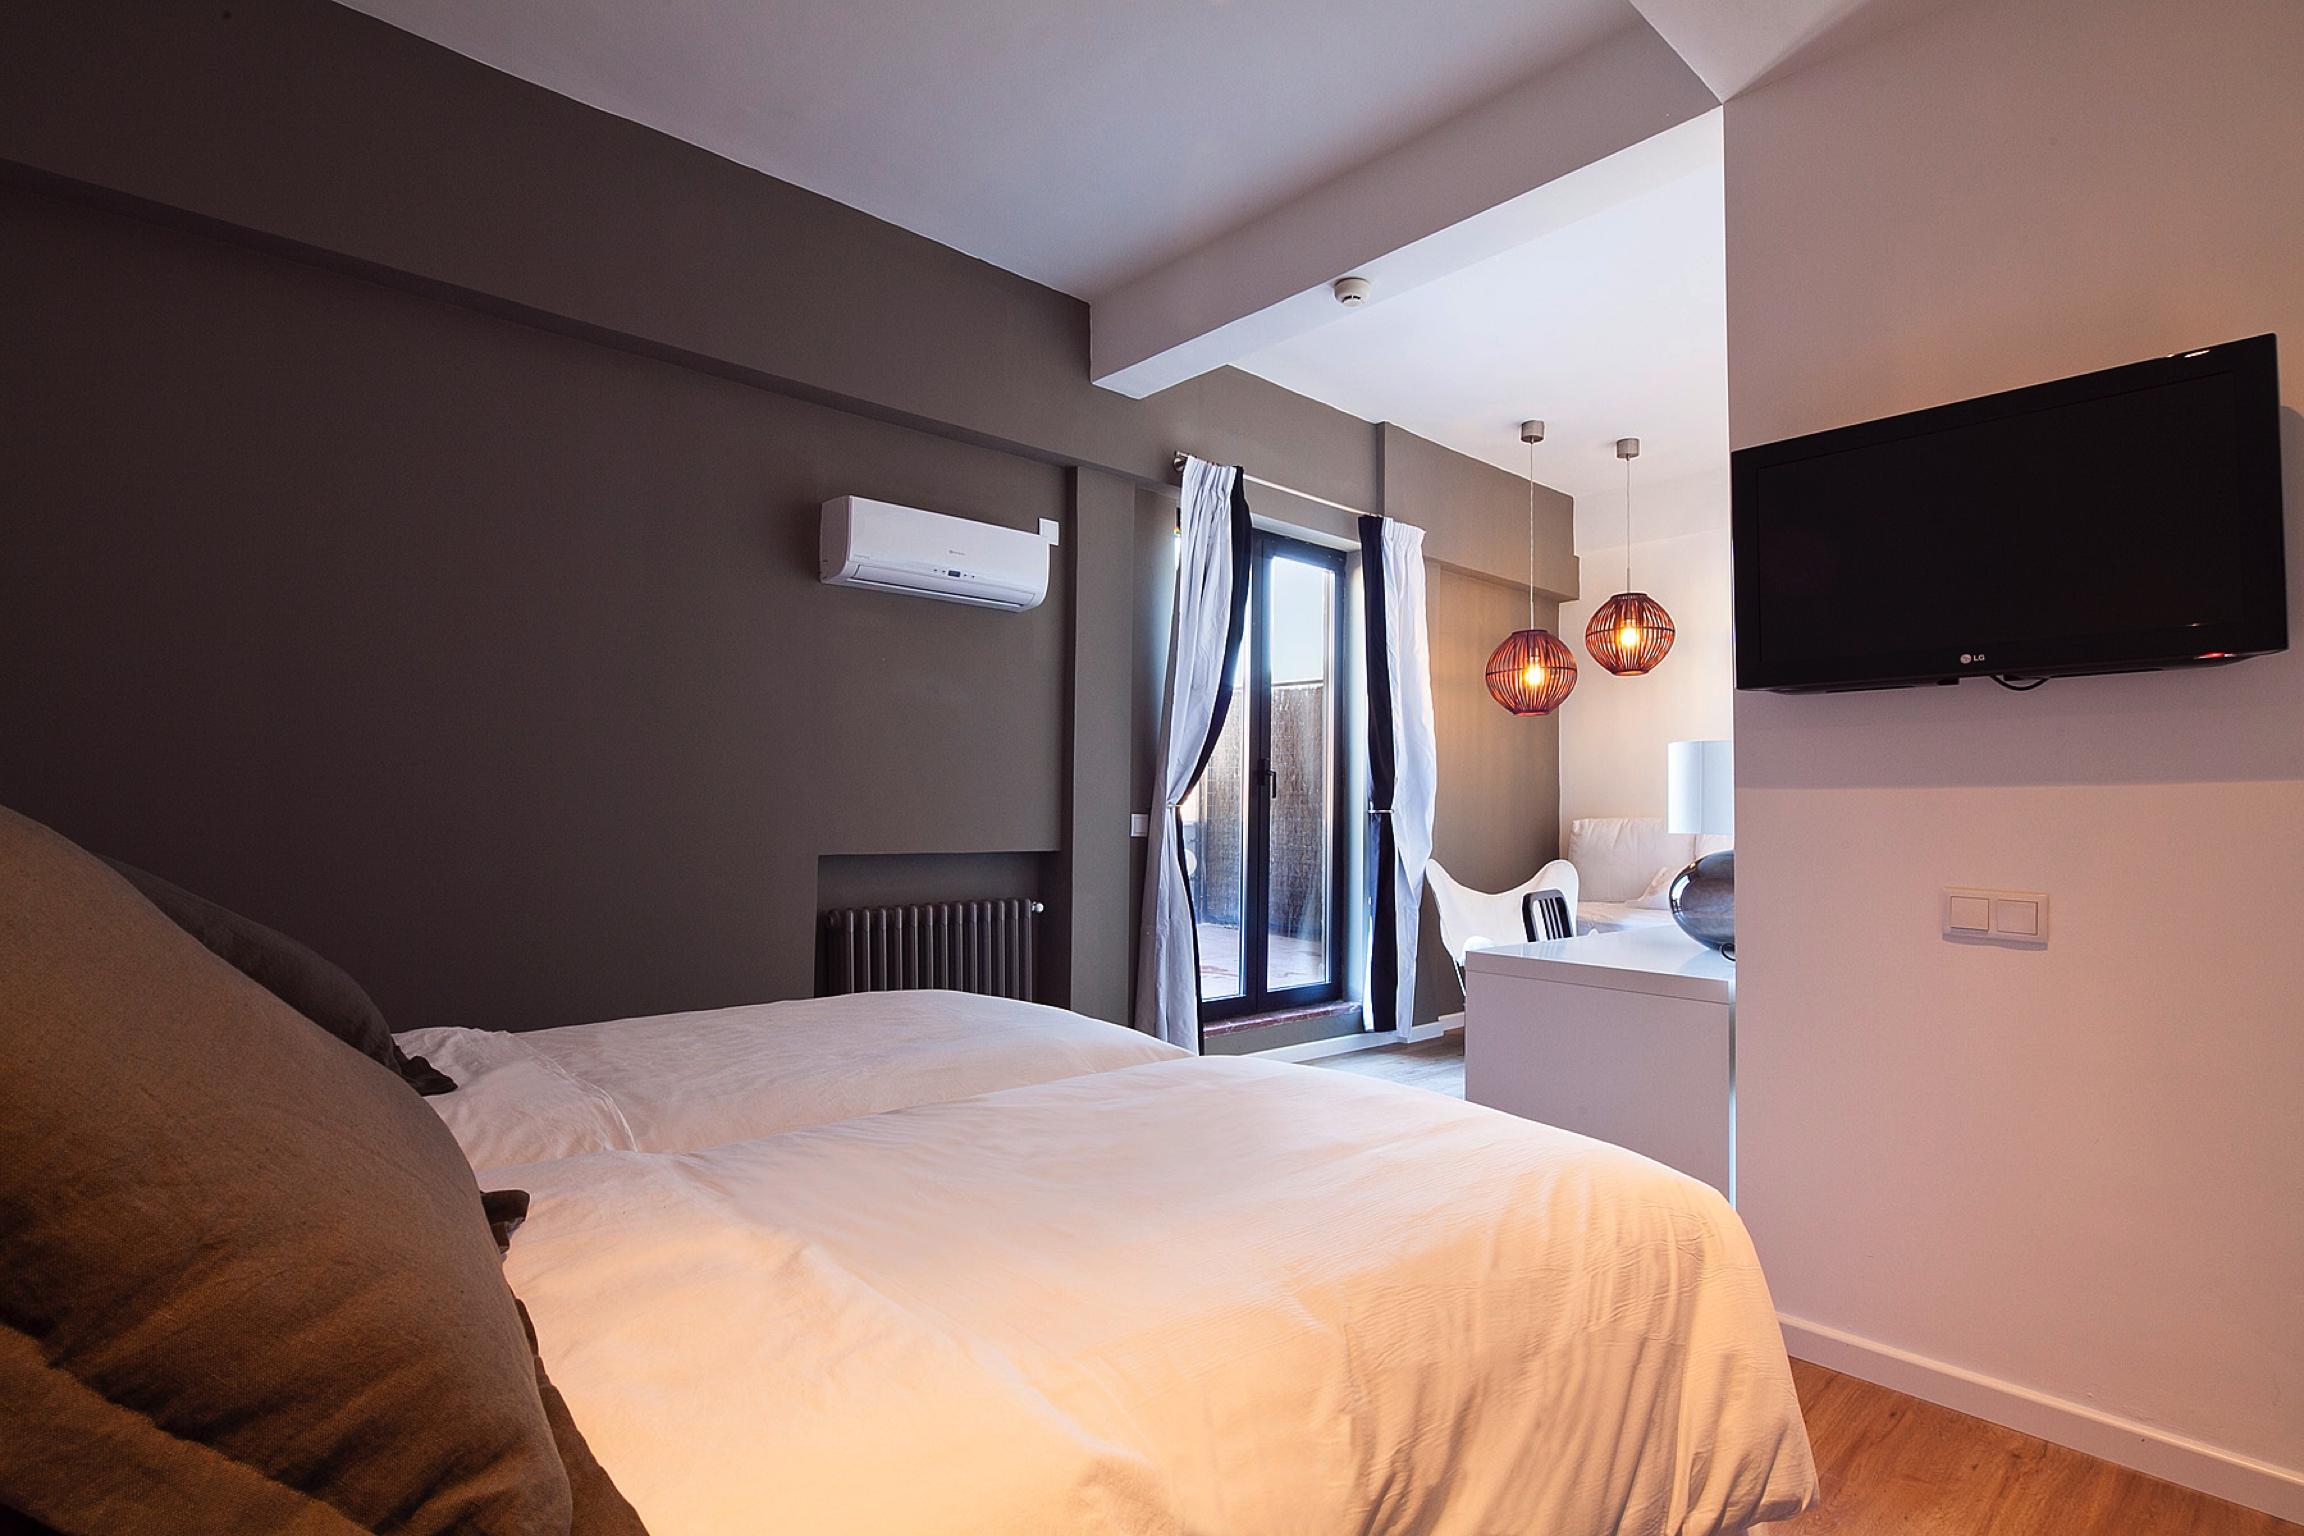 HOTEL_MADFOR_TRIPLE_TERRAZA_05